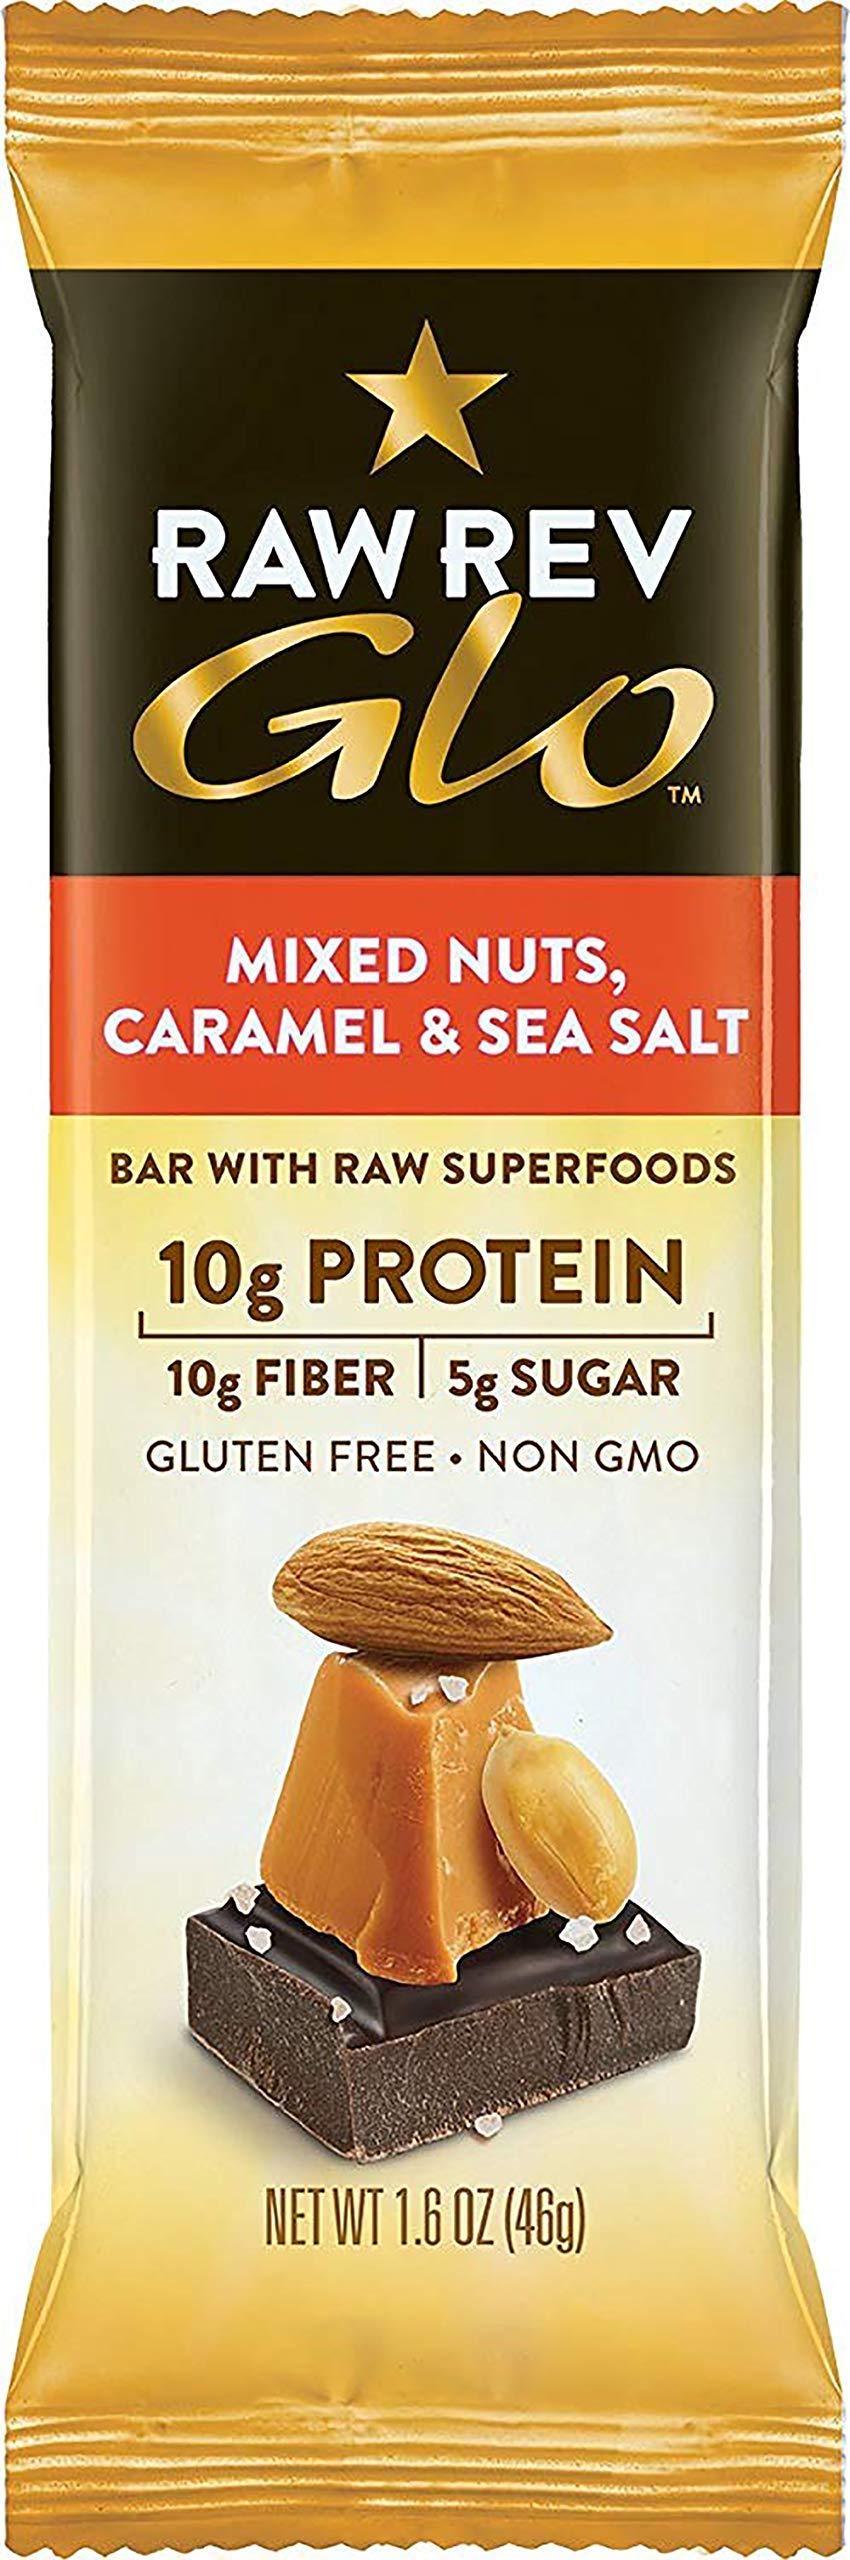 Raw Rev Glo Vegan, Gluten-Free Protein Bars - Mixed Nuts Caramel & Sea Salt 1.6 ounce (Pack of 144)